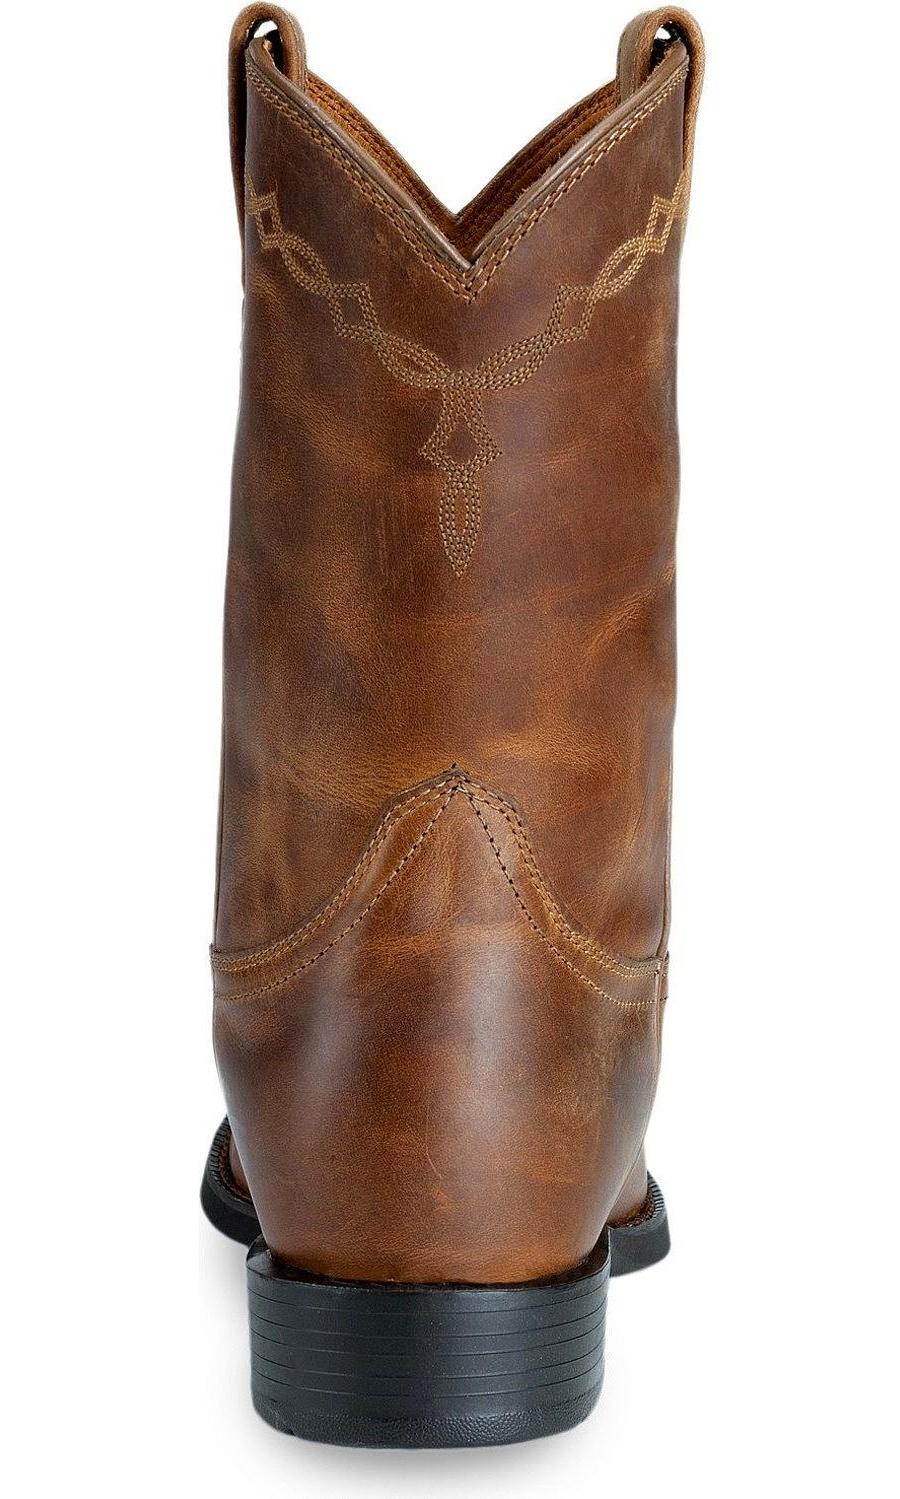 dd0de40f777 Ariat Men's Heritage Roper Western Cowboy Boot, Distressed Brown, 12 D US